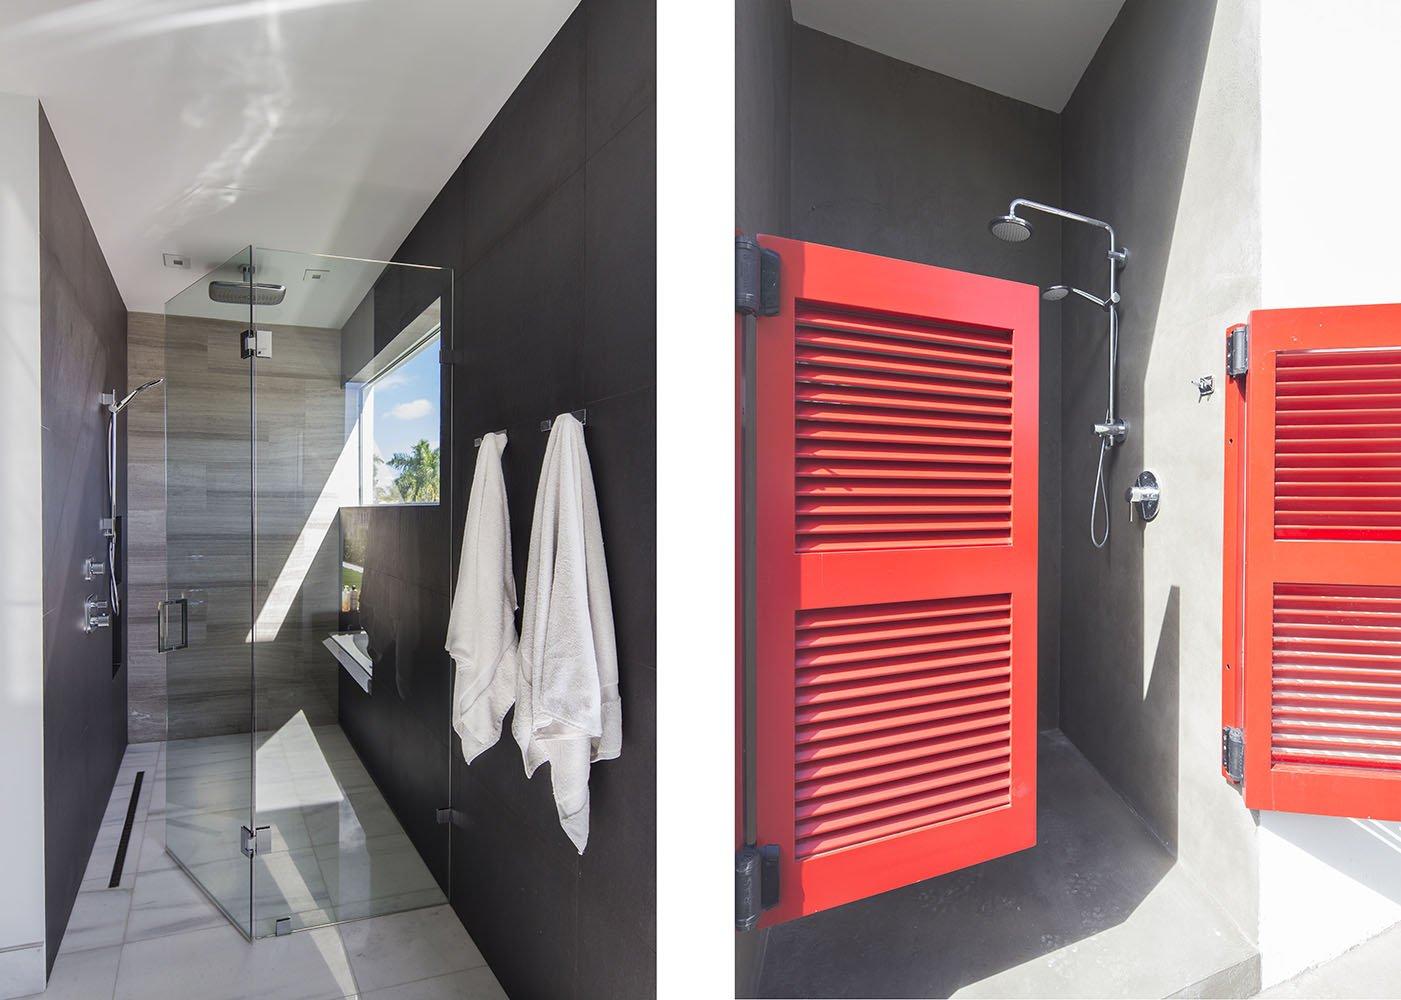 Bathroom Side View Interior Design project in 480 North Parkway, Florida